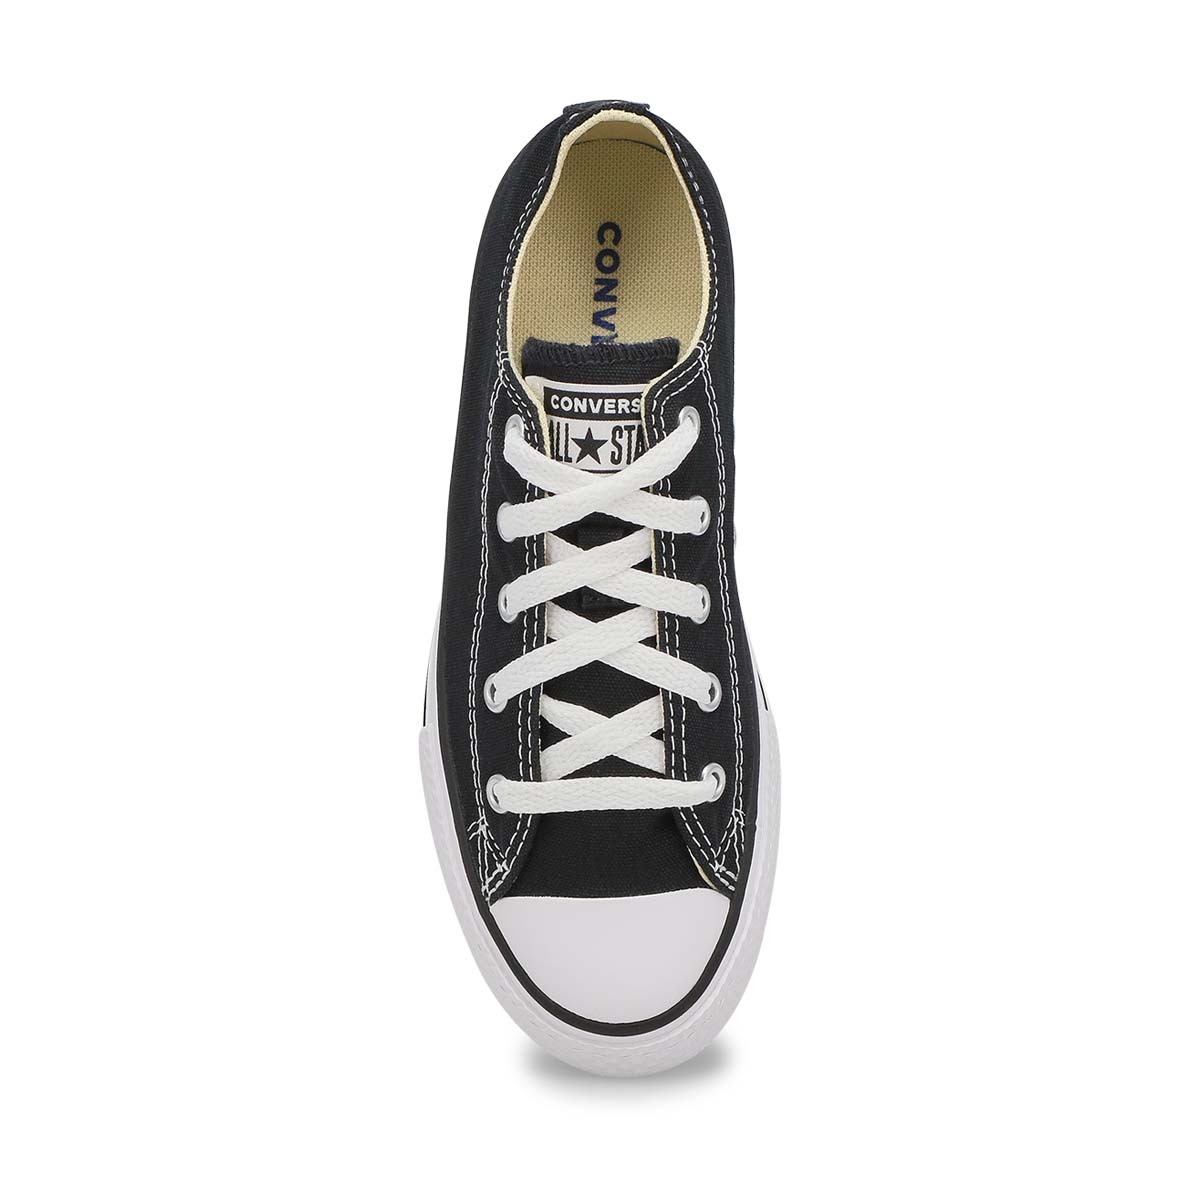 Kids' Chuck Taylor All Star Sneaker - Black